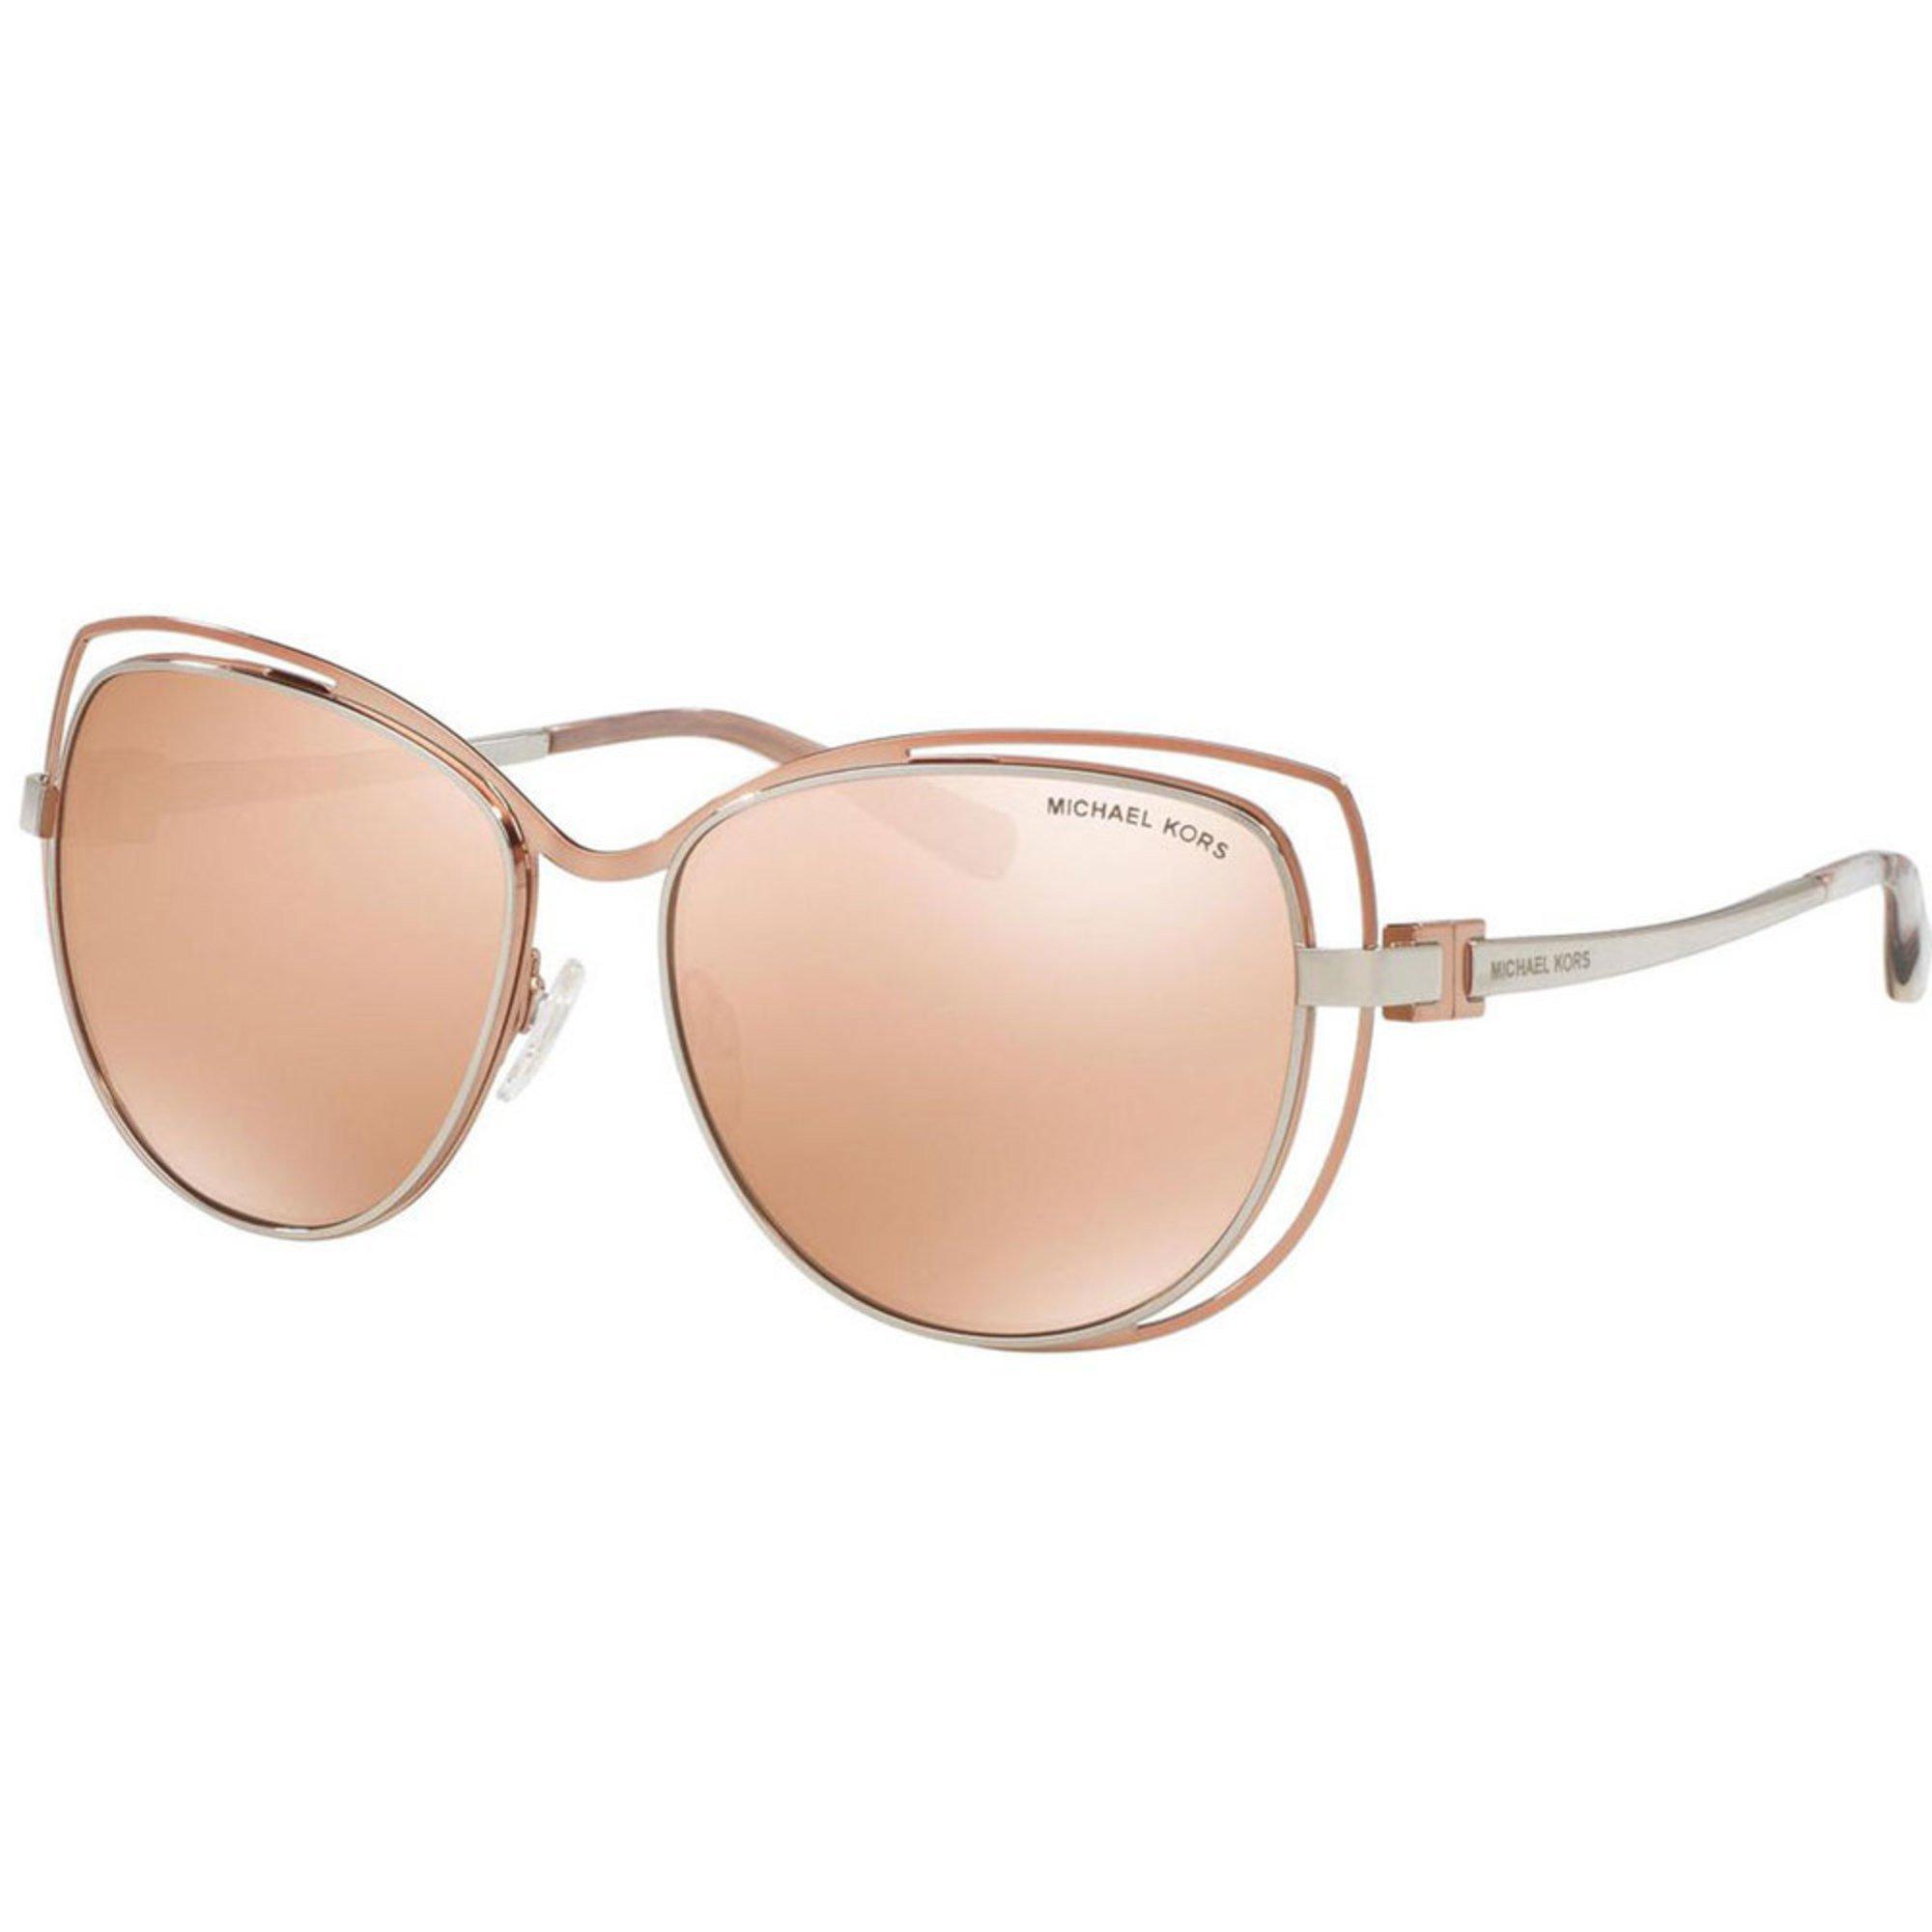 michael kors women 39 s silver rose gold rose gold flash sunglasses 58mm women 39 s sunglasses. Black Bedroom Furniture Sets. Home Design Ideas